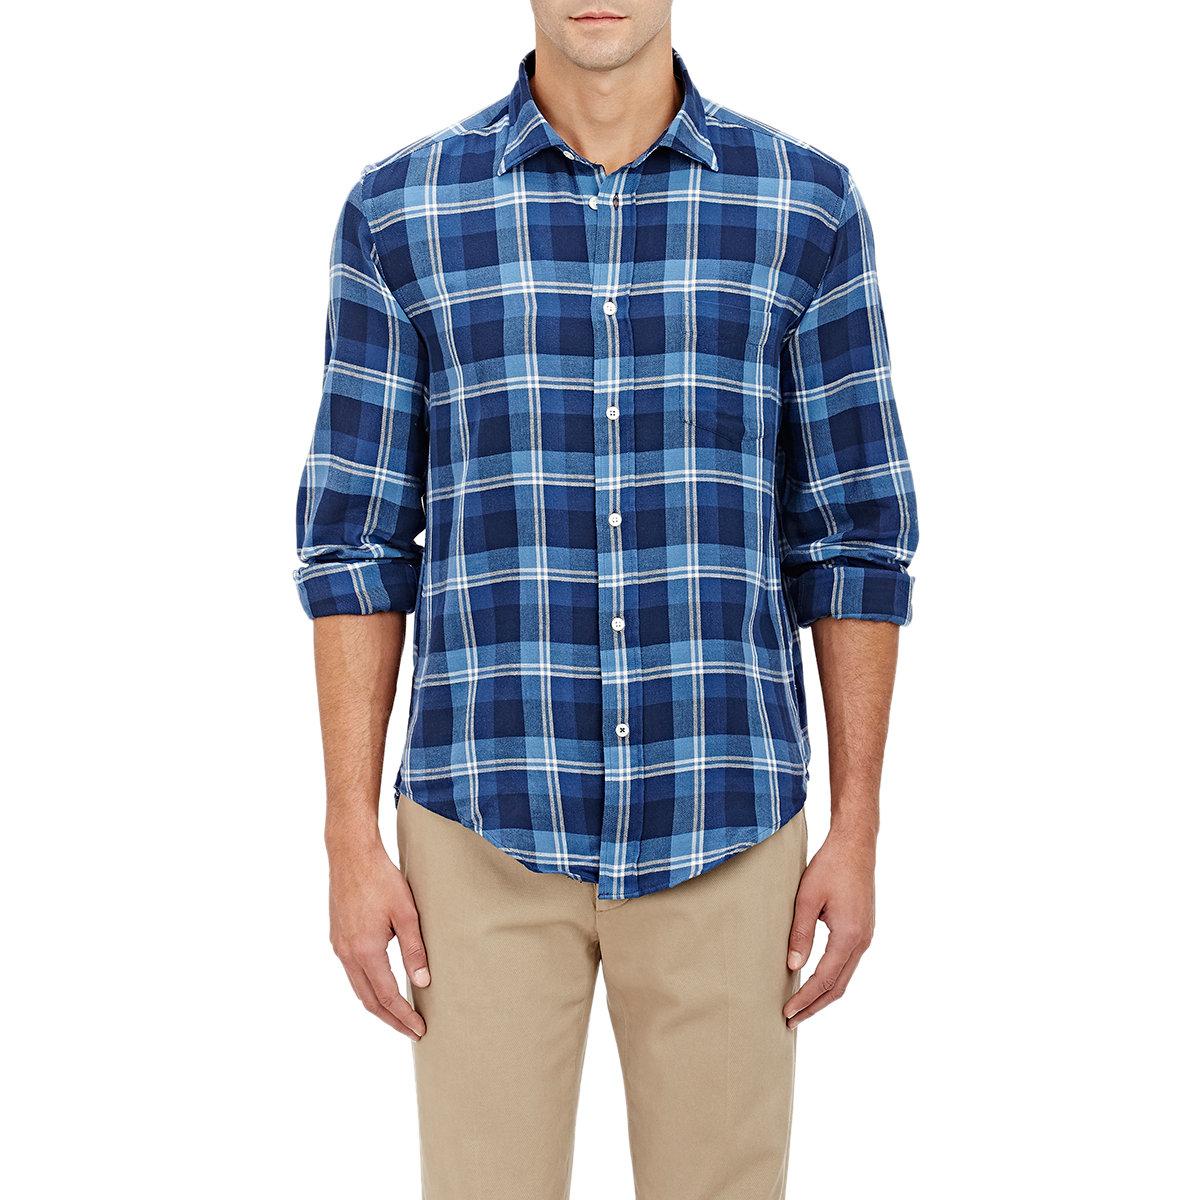 Hartford Windowpane Plaid Flannel Shirt In Blue For Men Lyst